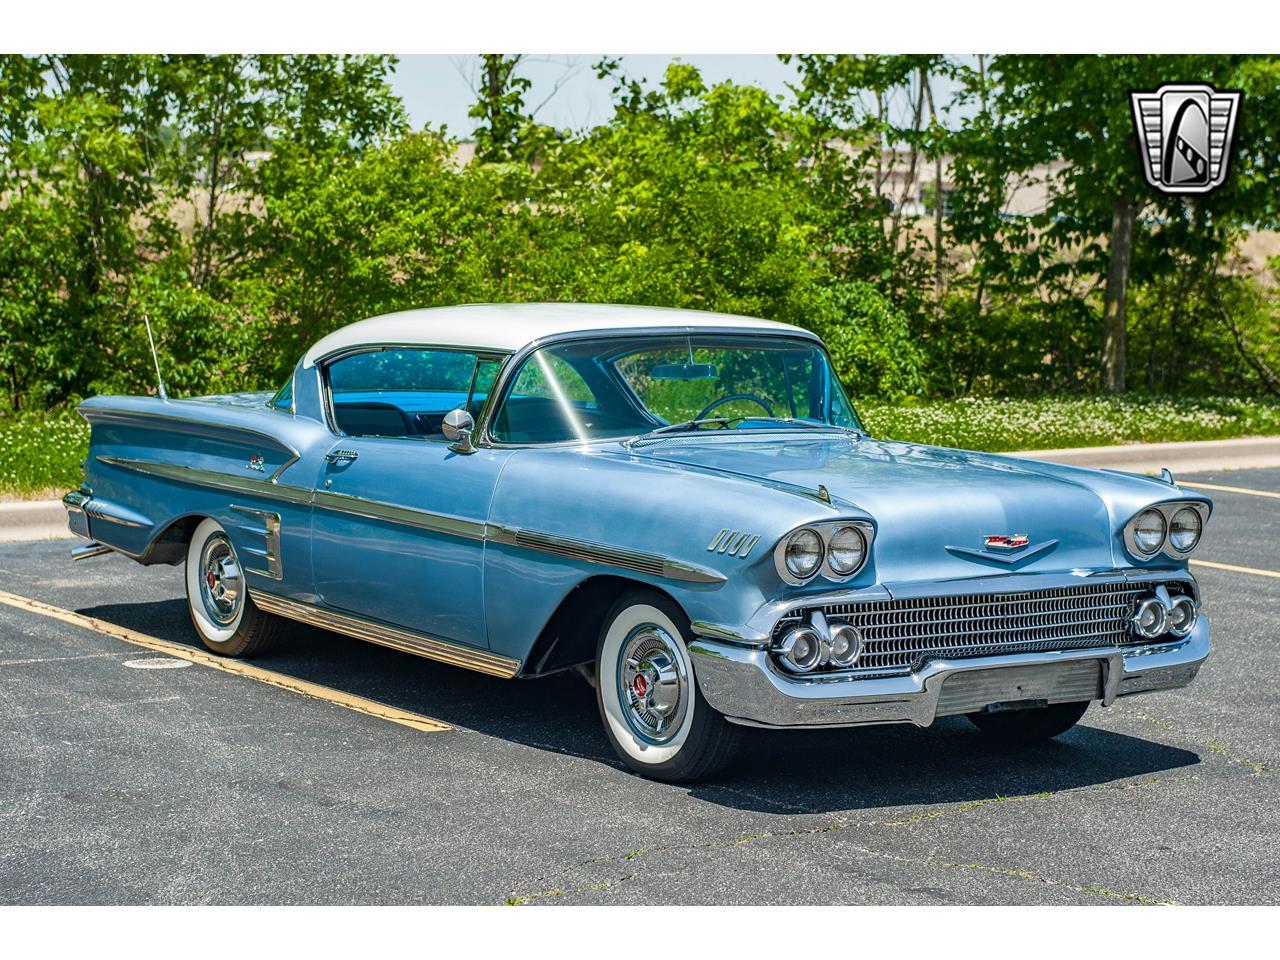 Large Picture of '58 Chevrolet Impala located in O'Fallon Illinois - $62,000.00 - QB9Q